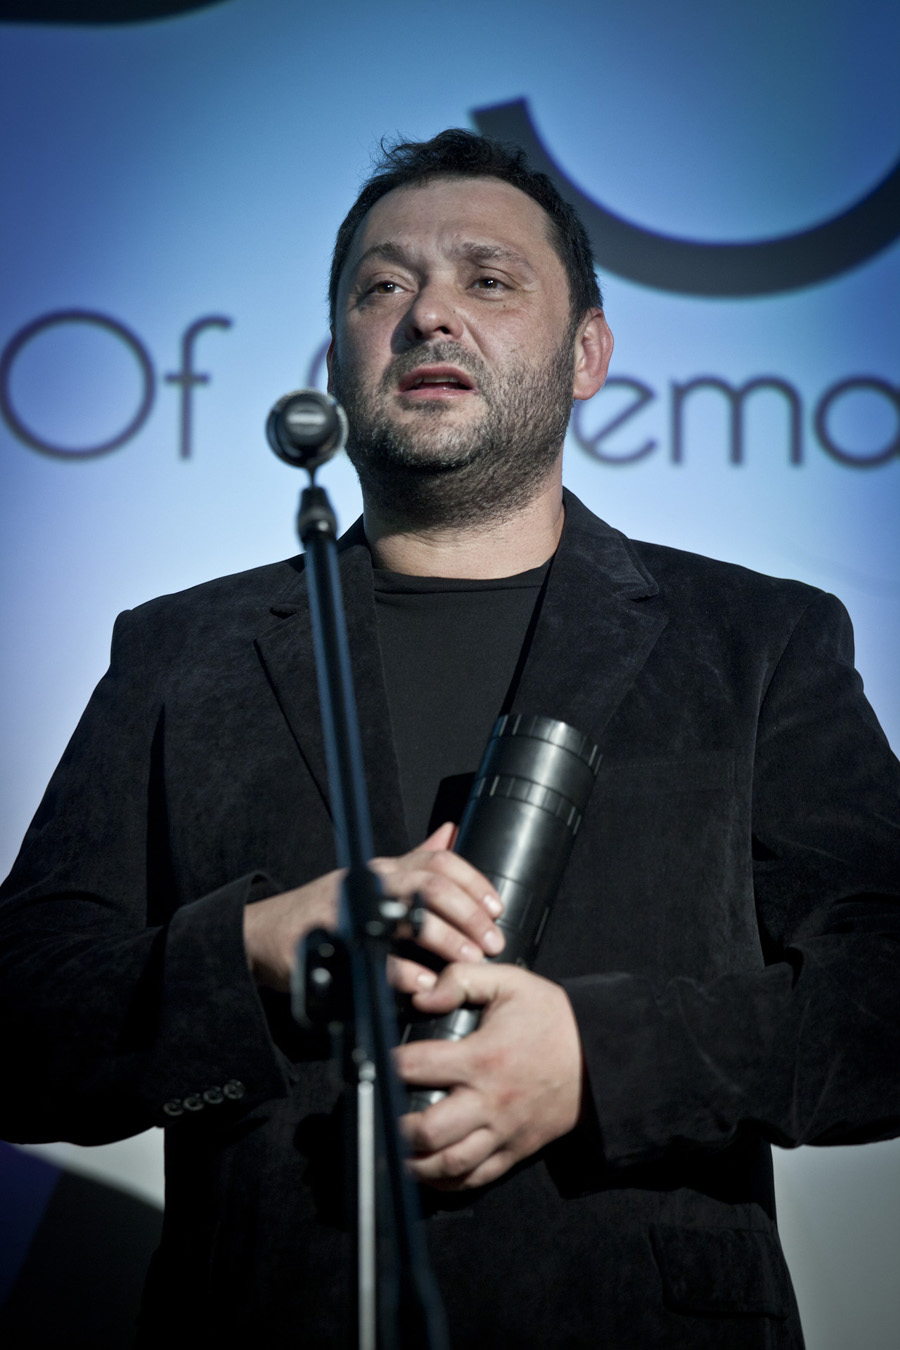 50_psc-nagroda-strumillo-jezierski-15